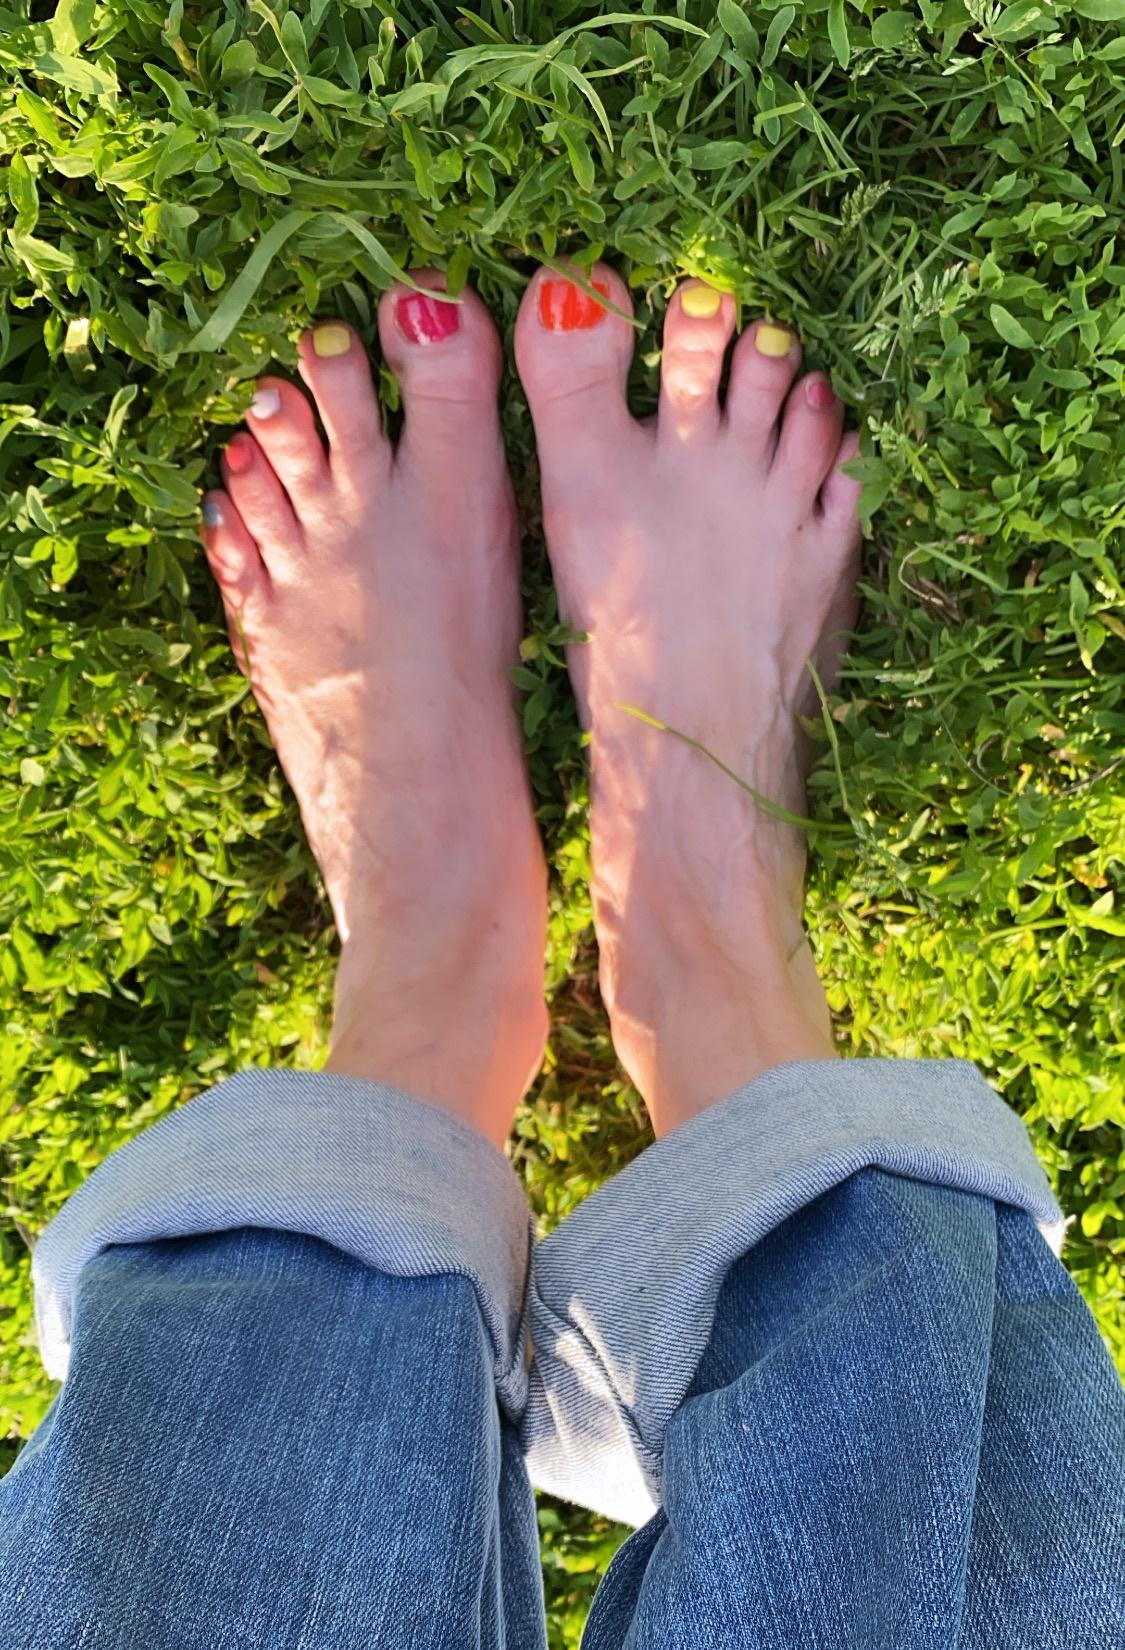 glamupyourlifestyle gitti vegane-Nagellacke Nägel Nagelpflege